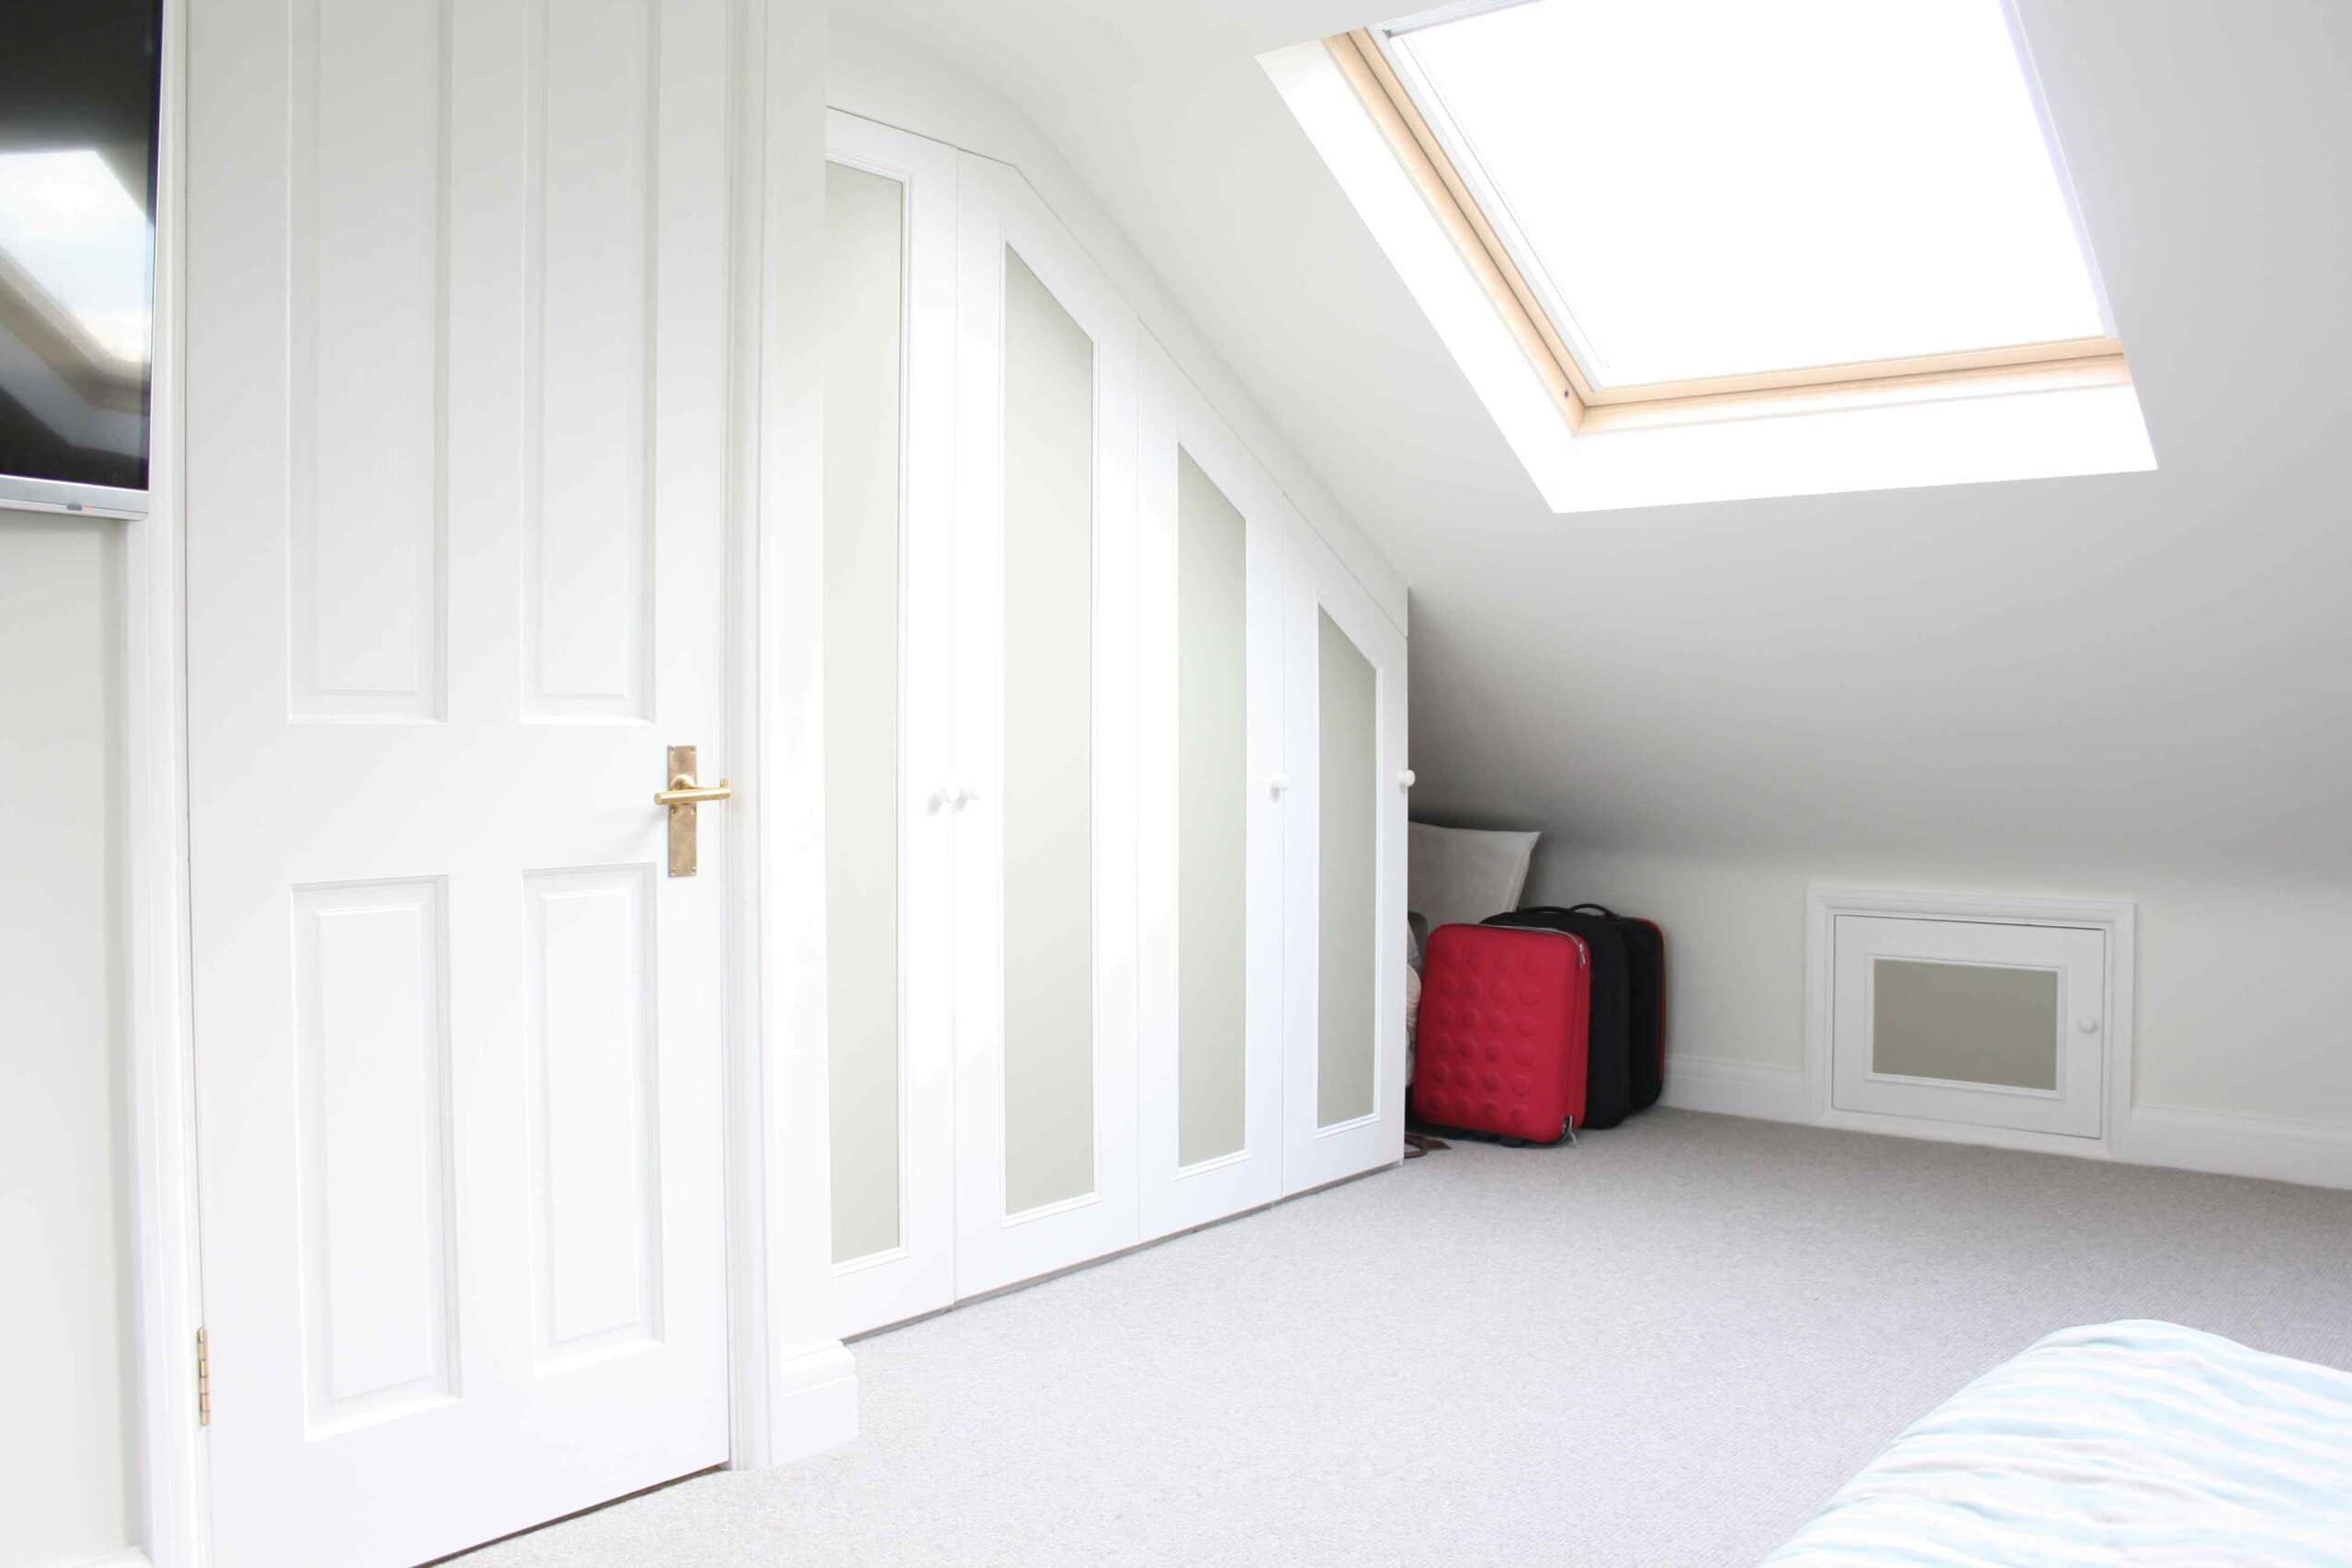 Loft conversion Storage Solutions & How to use dead space in a loft conversion - Simply Loft London Loft ...